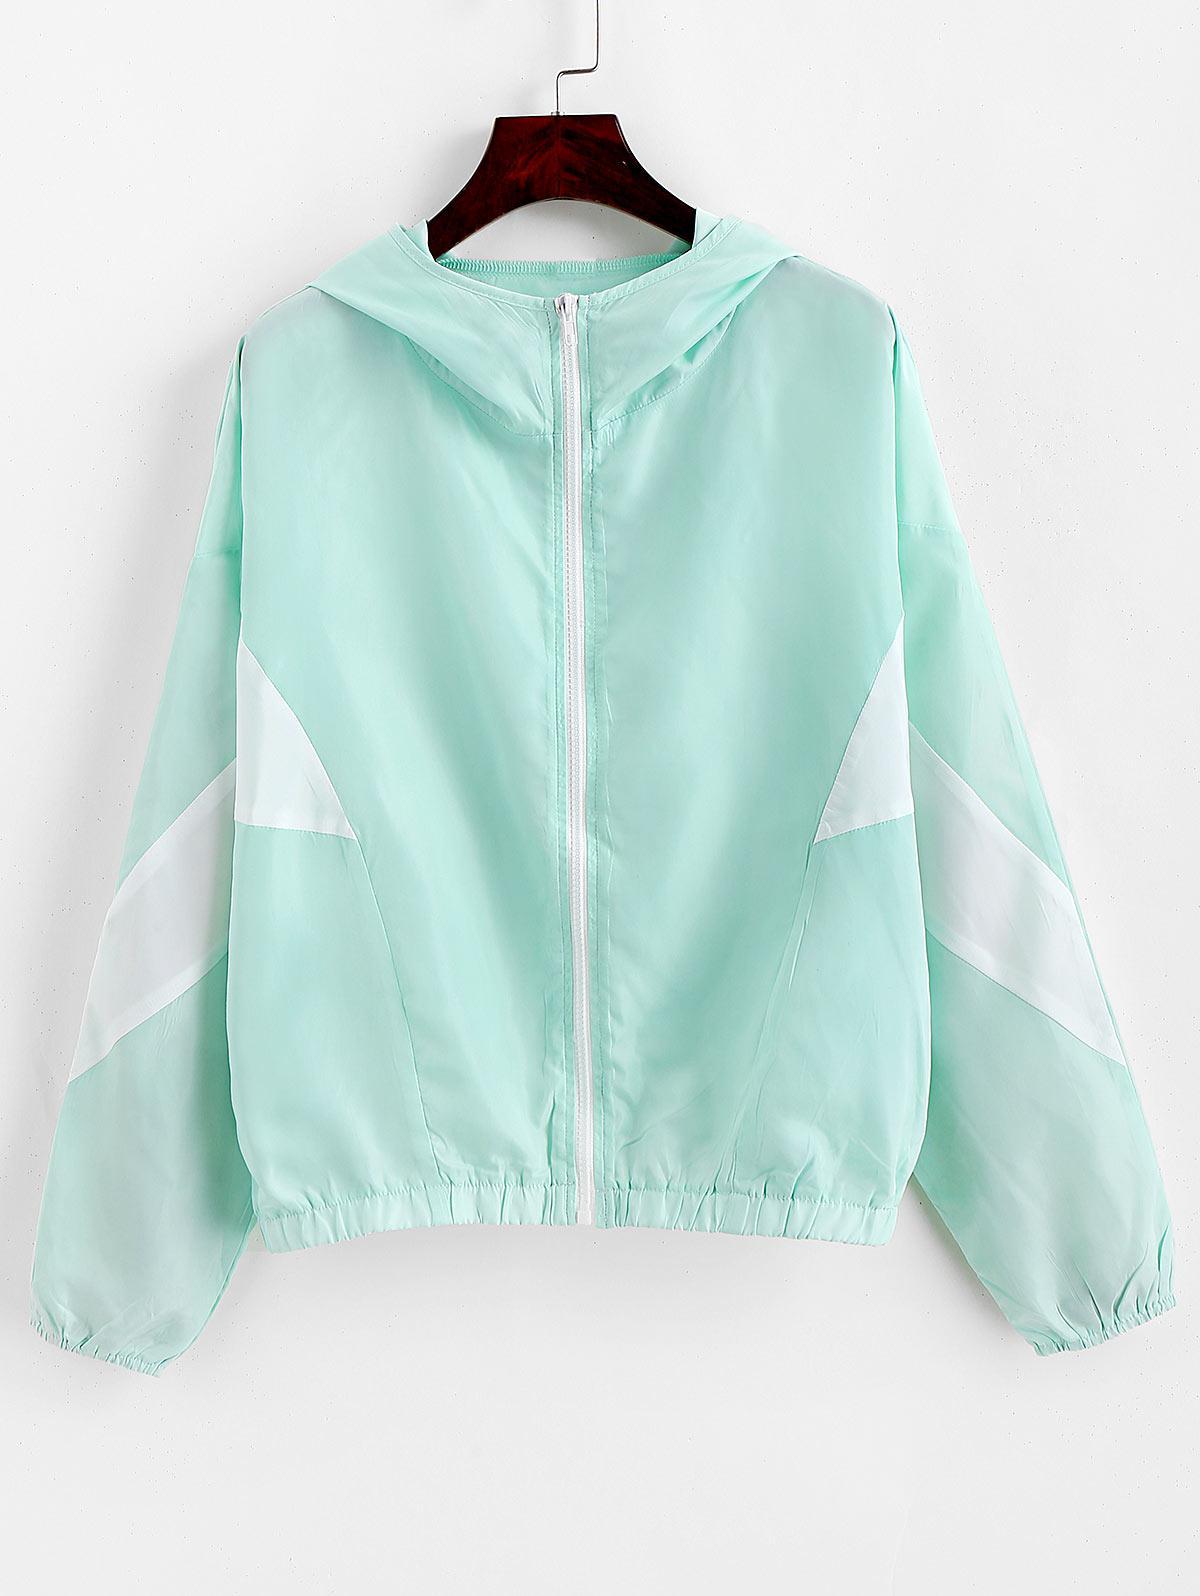 ZAFUL Hooded Zip Batwing Sleeve Two Tone Jacket, Mint green